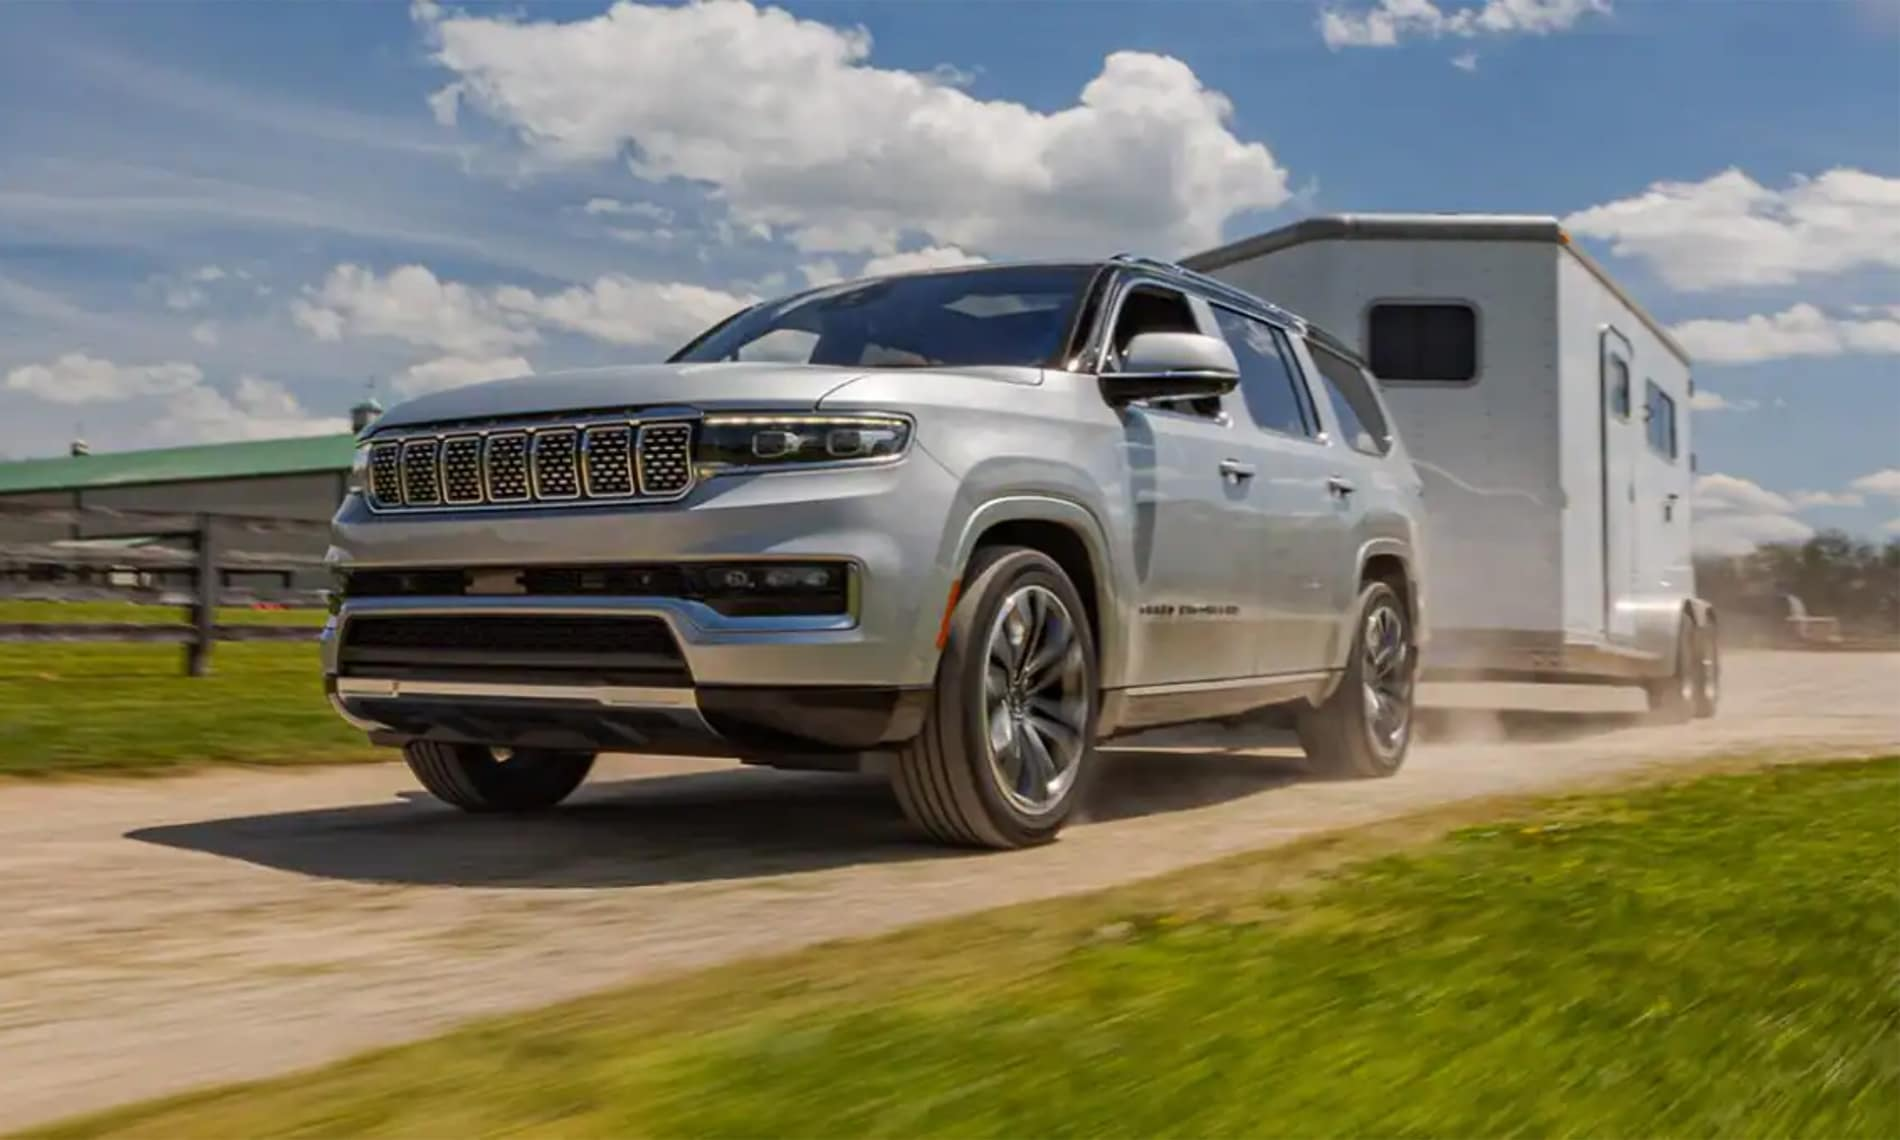 2022 Jeep Grand Wagoneer in St. Louis